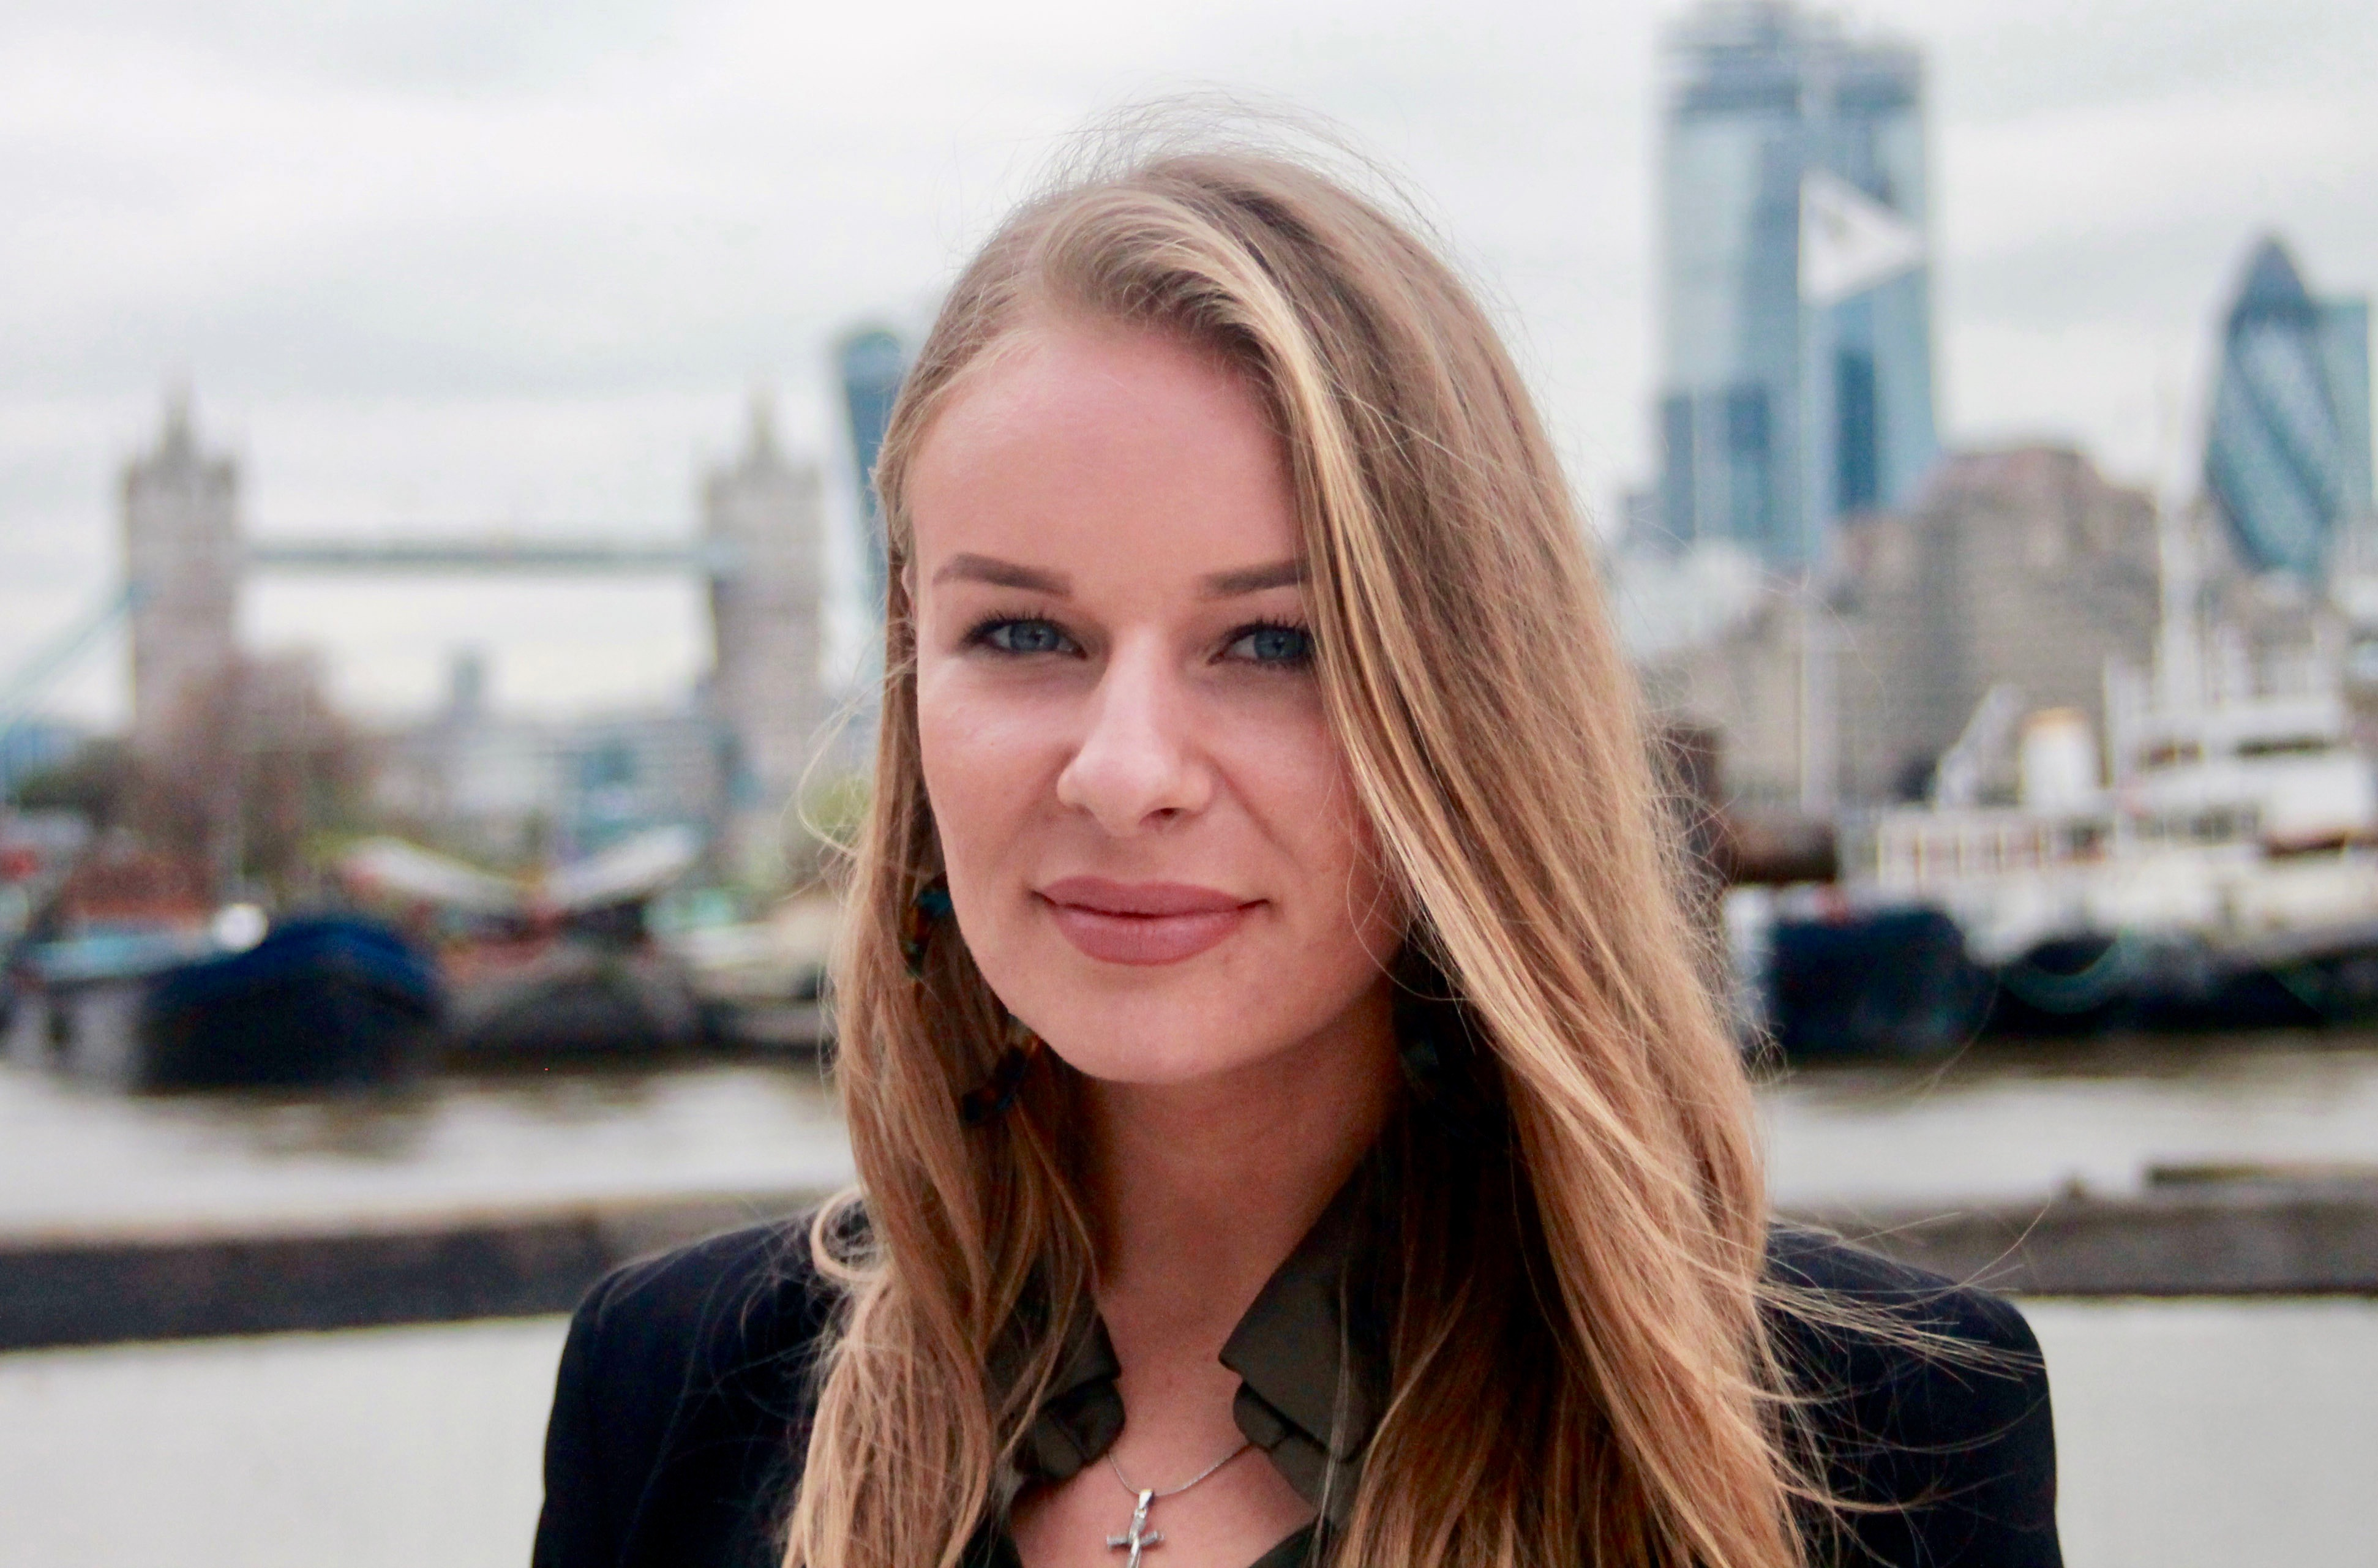 Iulia Mihalache Recruiting Technicians Globally